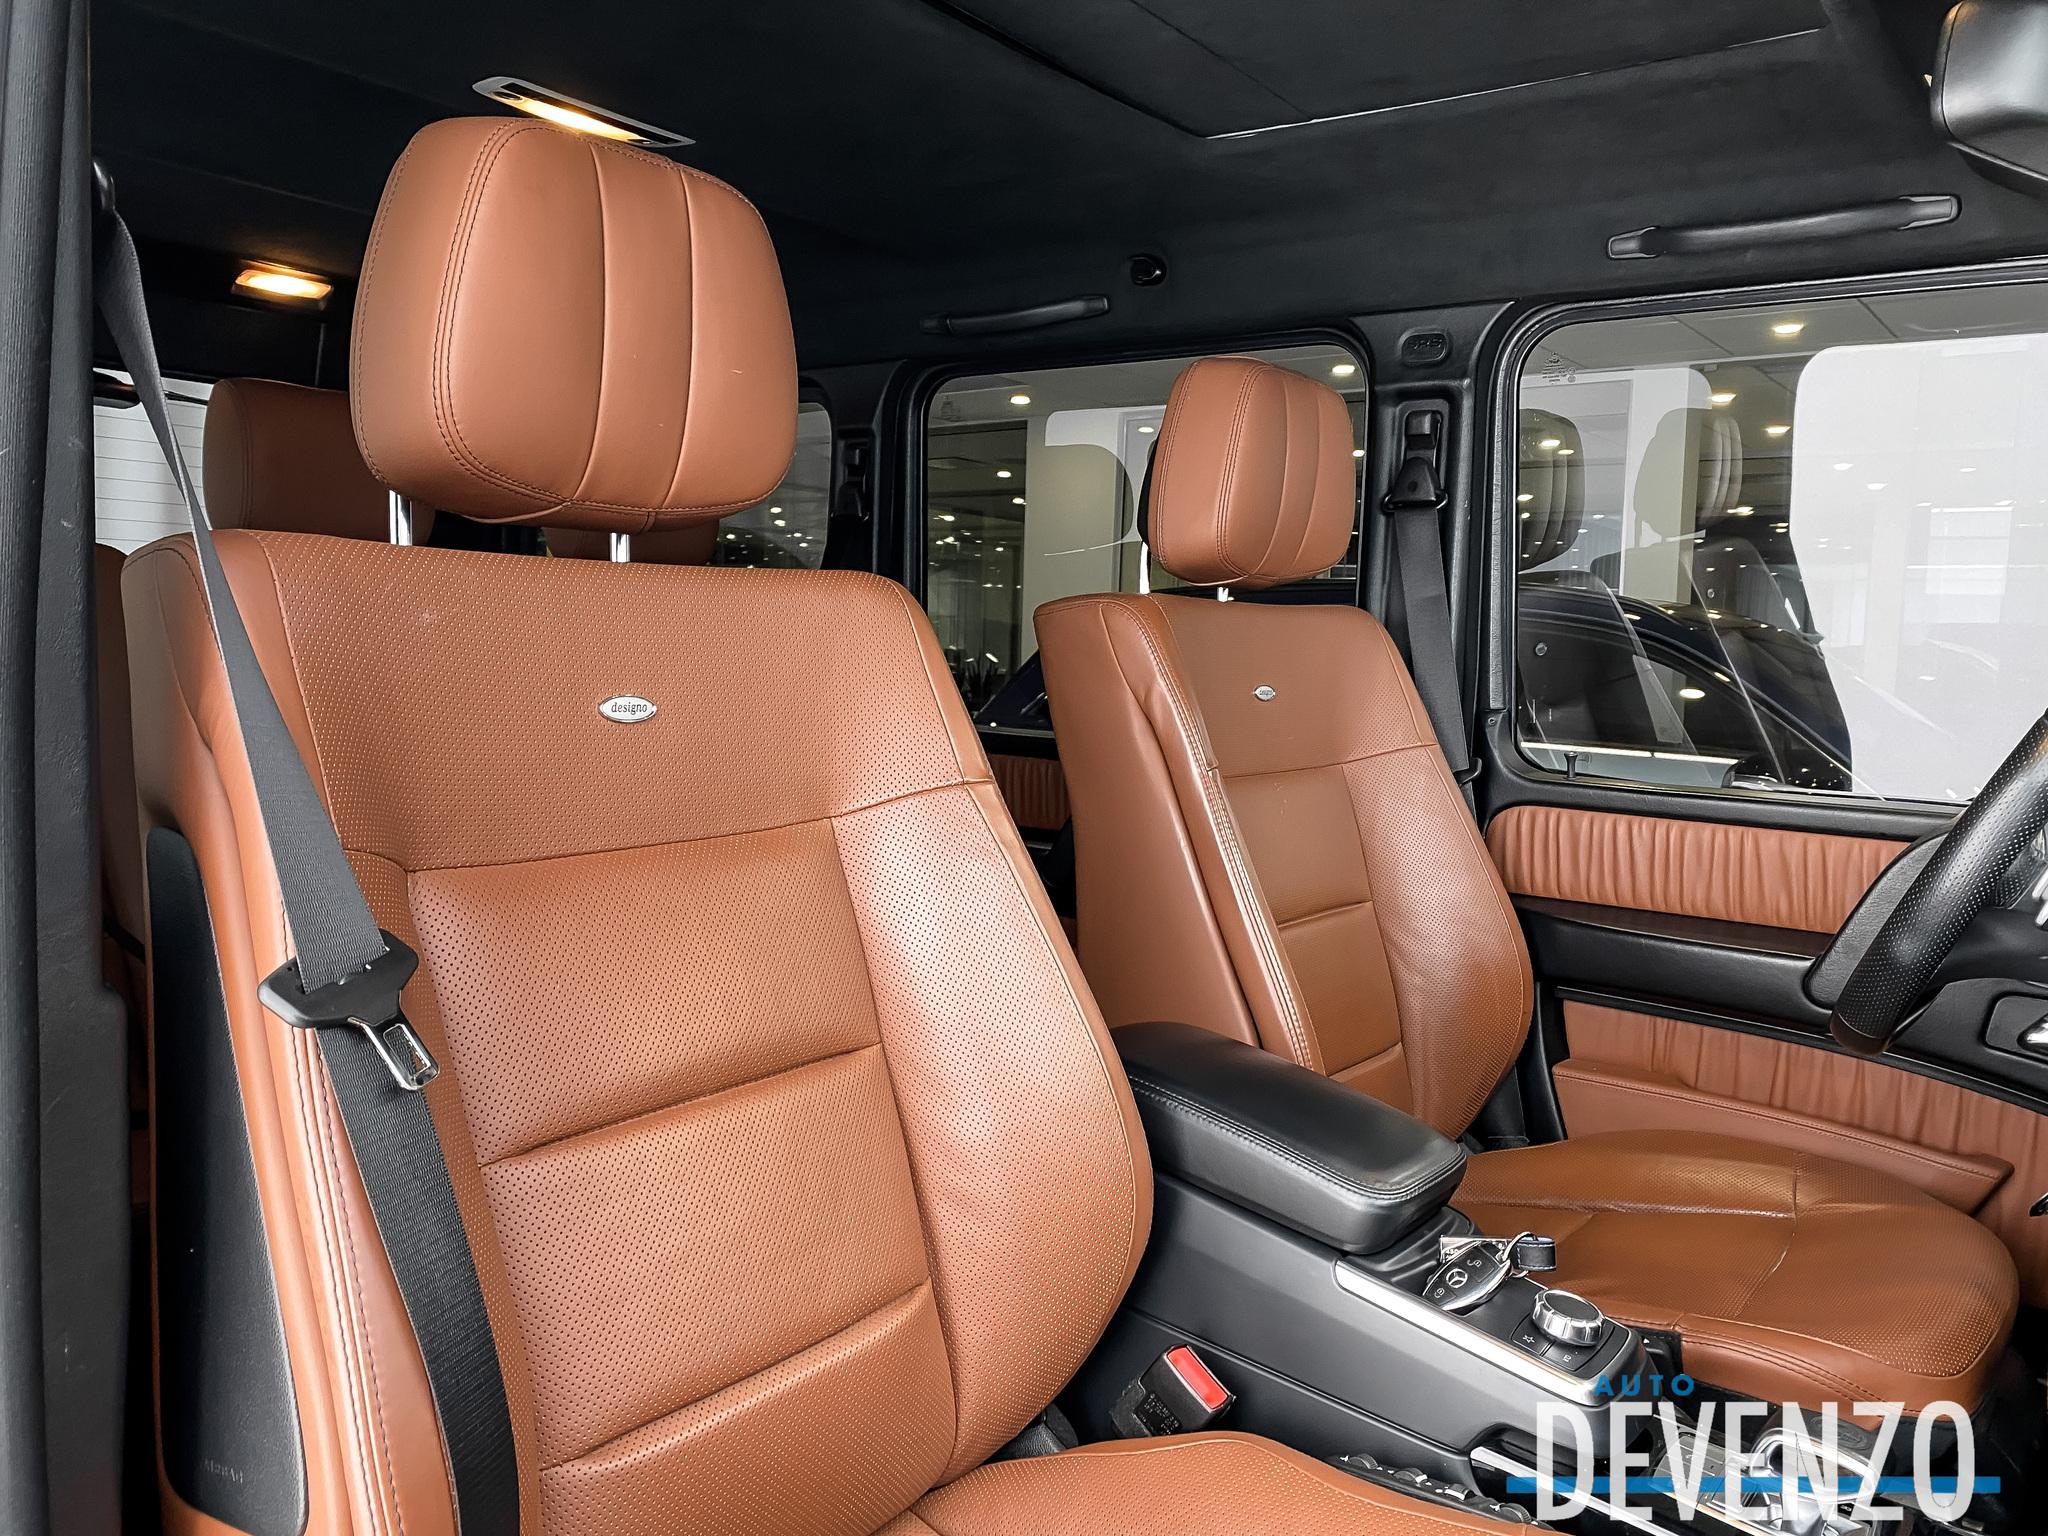 2015 Mercedes-Benz G-Class G63 AMG V8 BITURBO DESIGNO / BRABUS complet